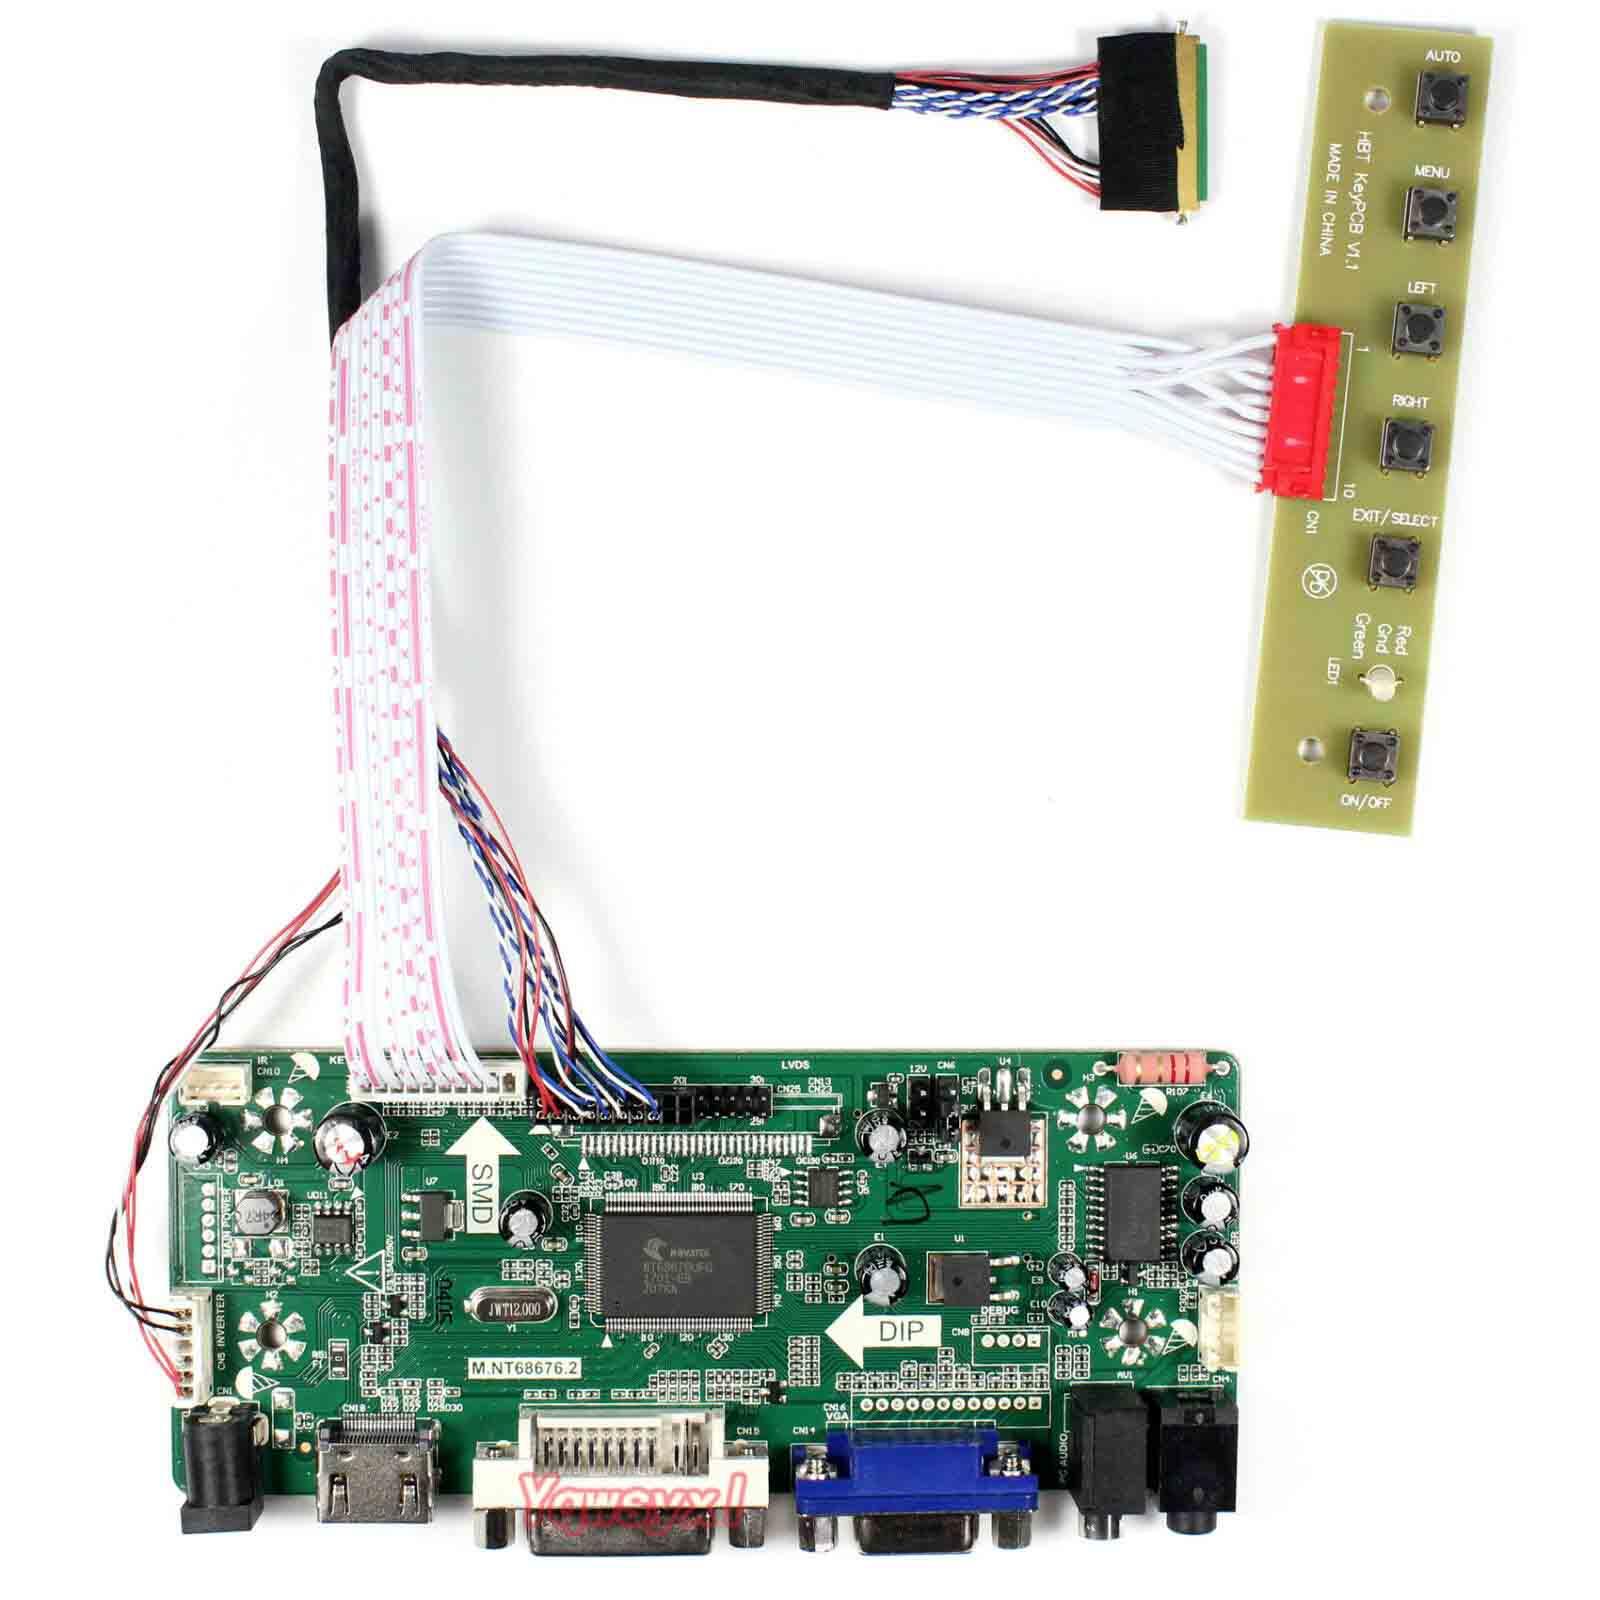 Yqwsyxl Control Board Monitor Kit For B140XW03 V0 V.0  HDMI + DVI + VGA LCD LED Screen Controller Board Driver